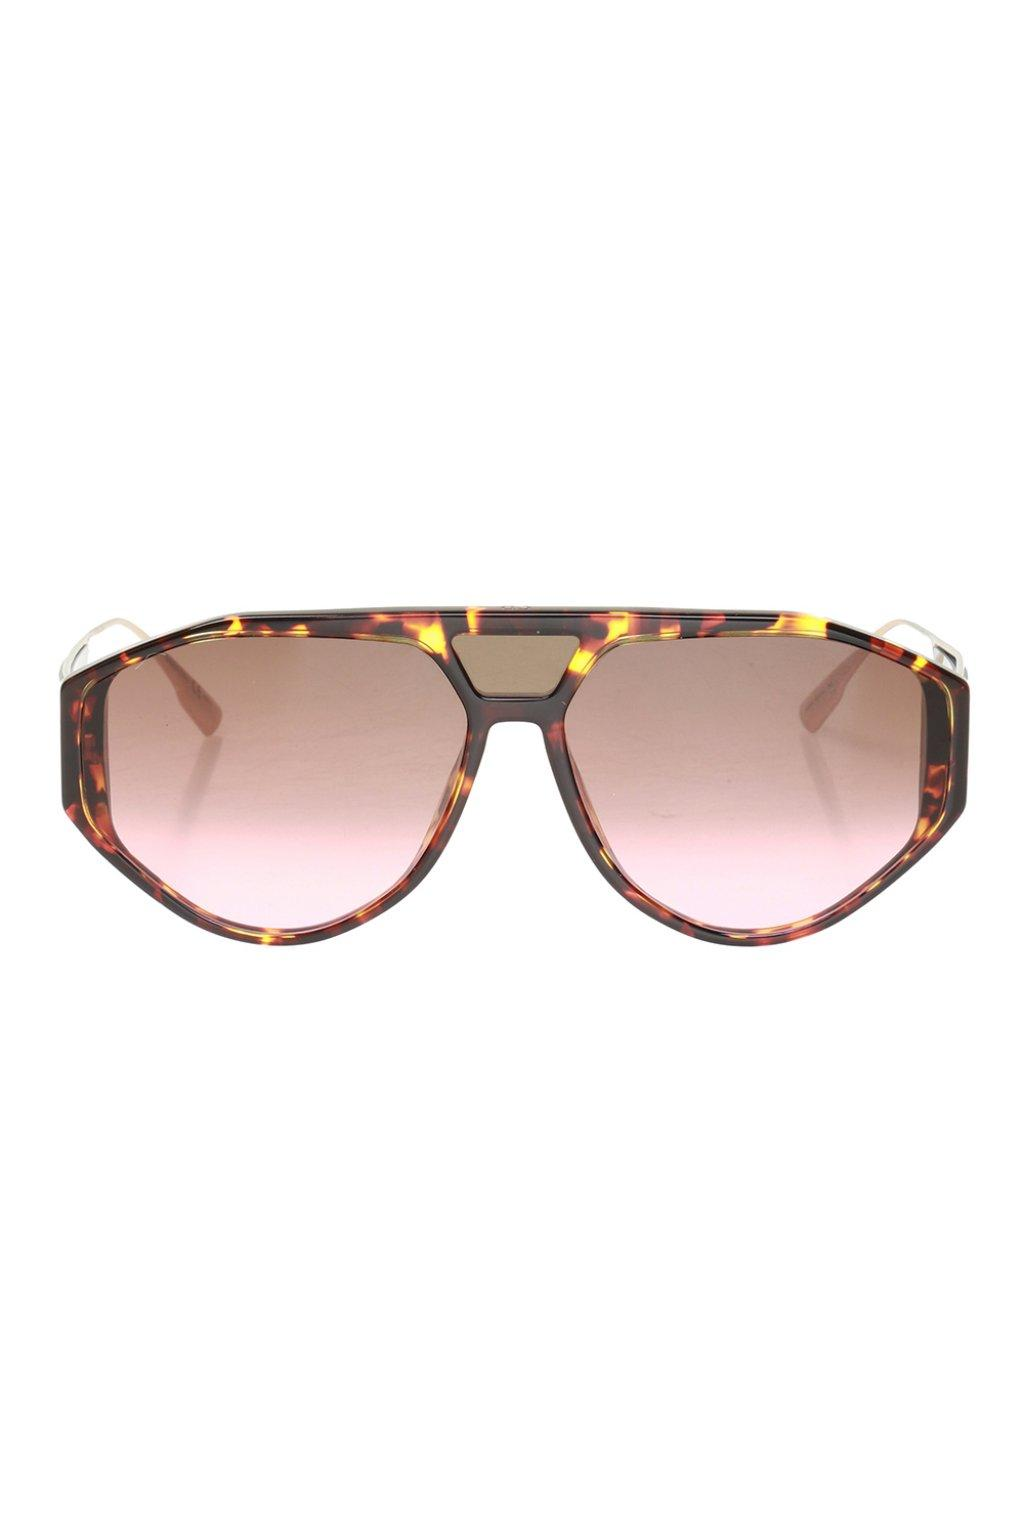 3df0e5e302ed Dior 'clan1' Sunglasses With Logo in Brown for Men - Lyst